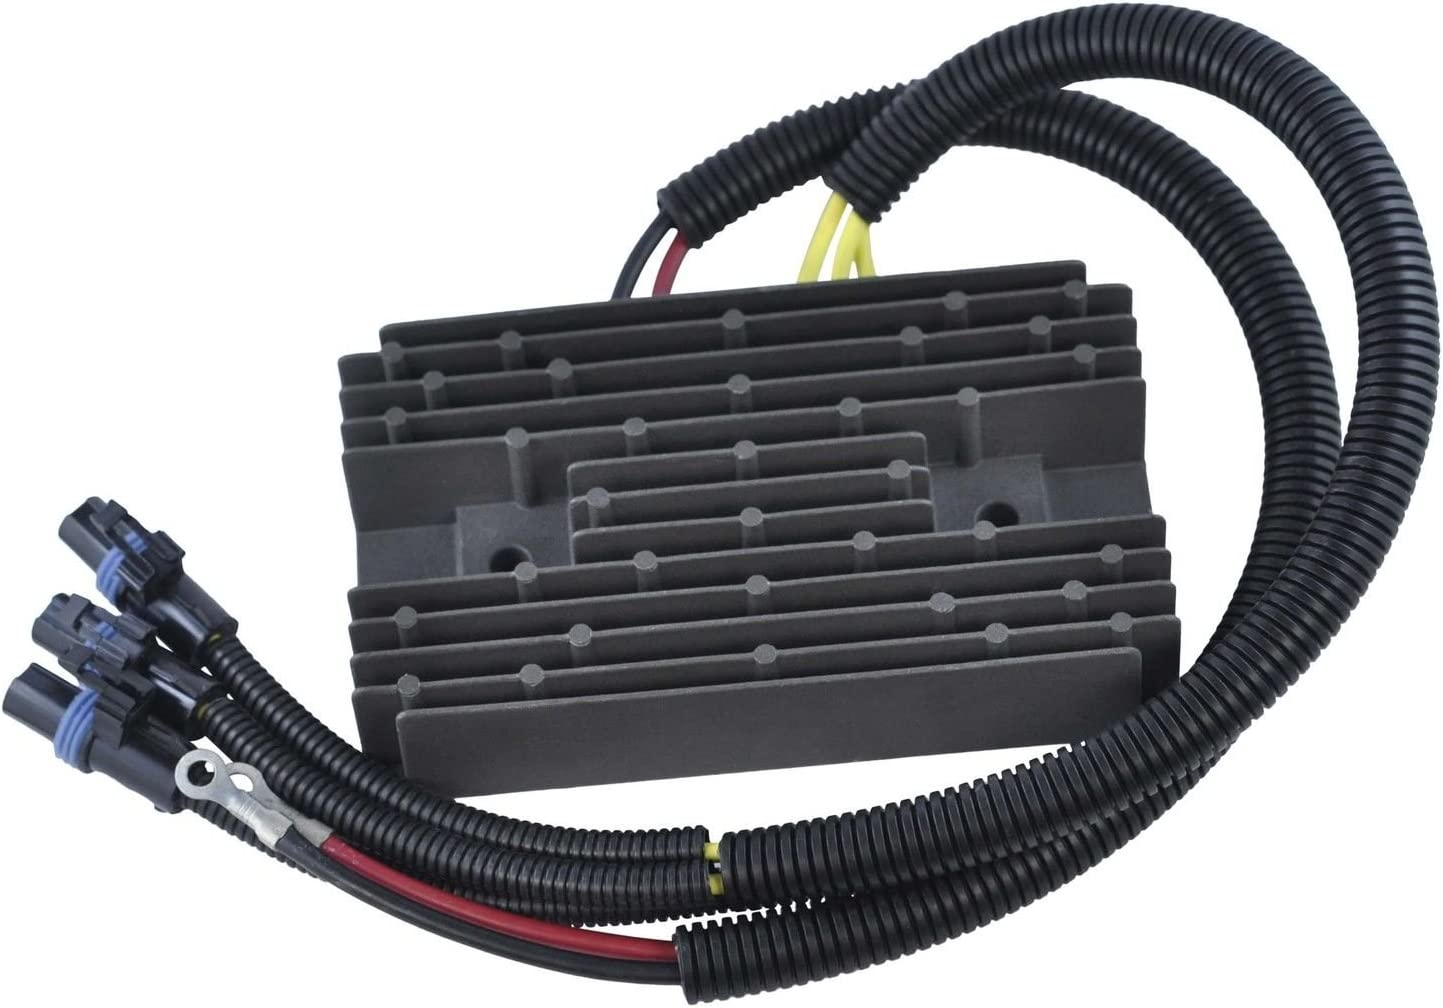 Mosfet Voltage Regulator Rectifier For Polaris RZR 900 XP 2011 RZR 4 900 XP 2012